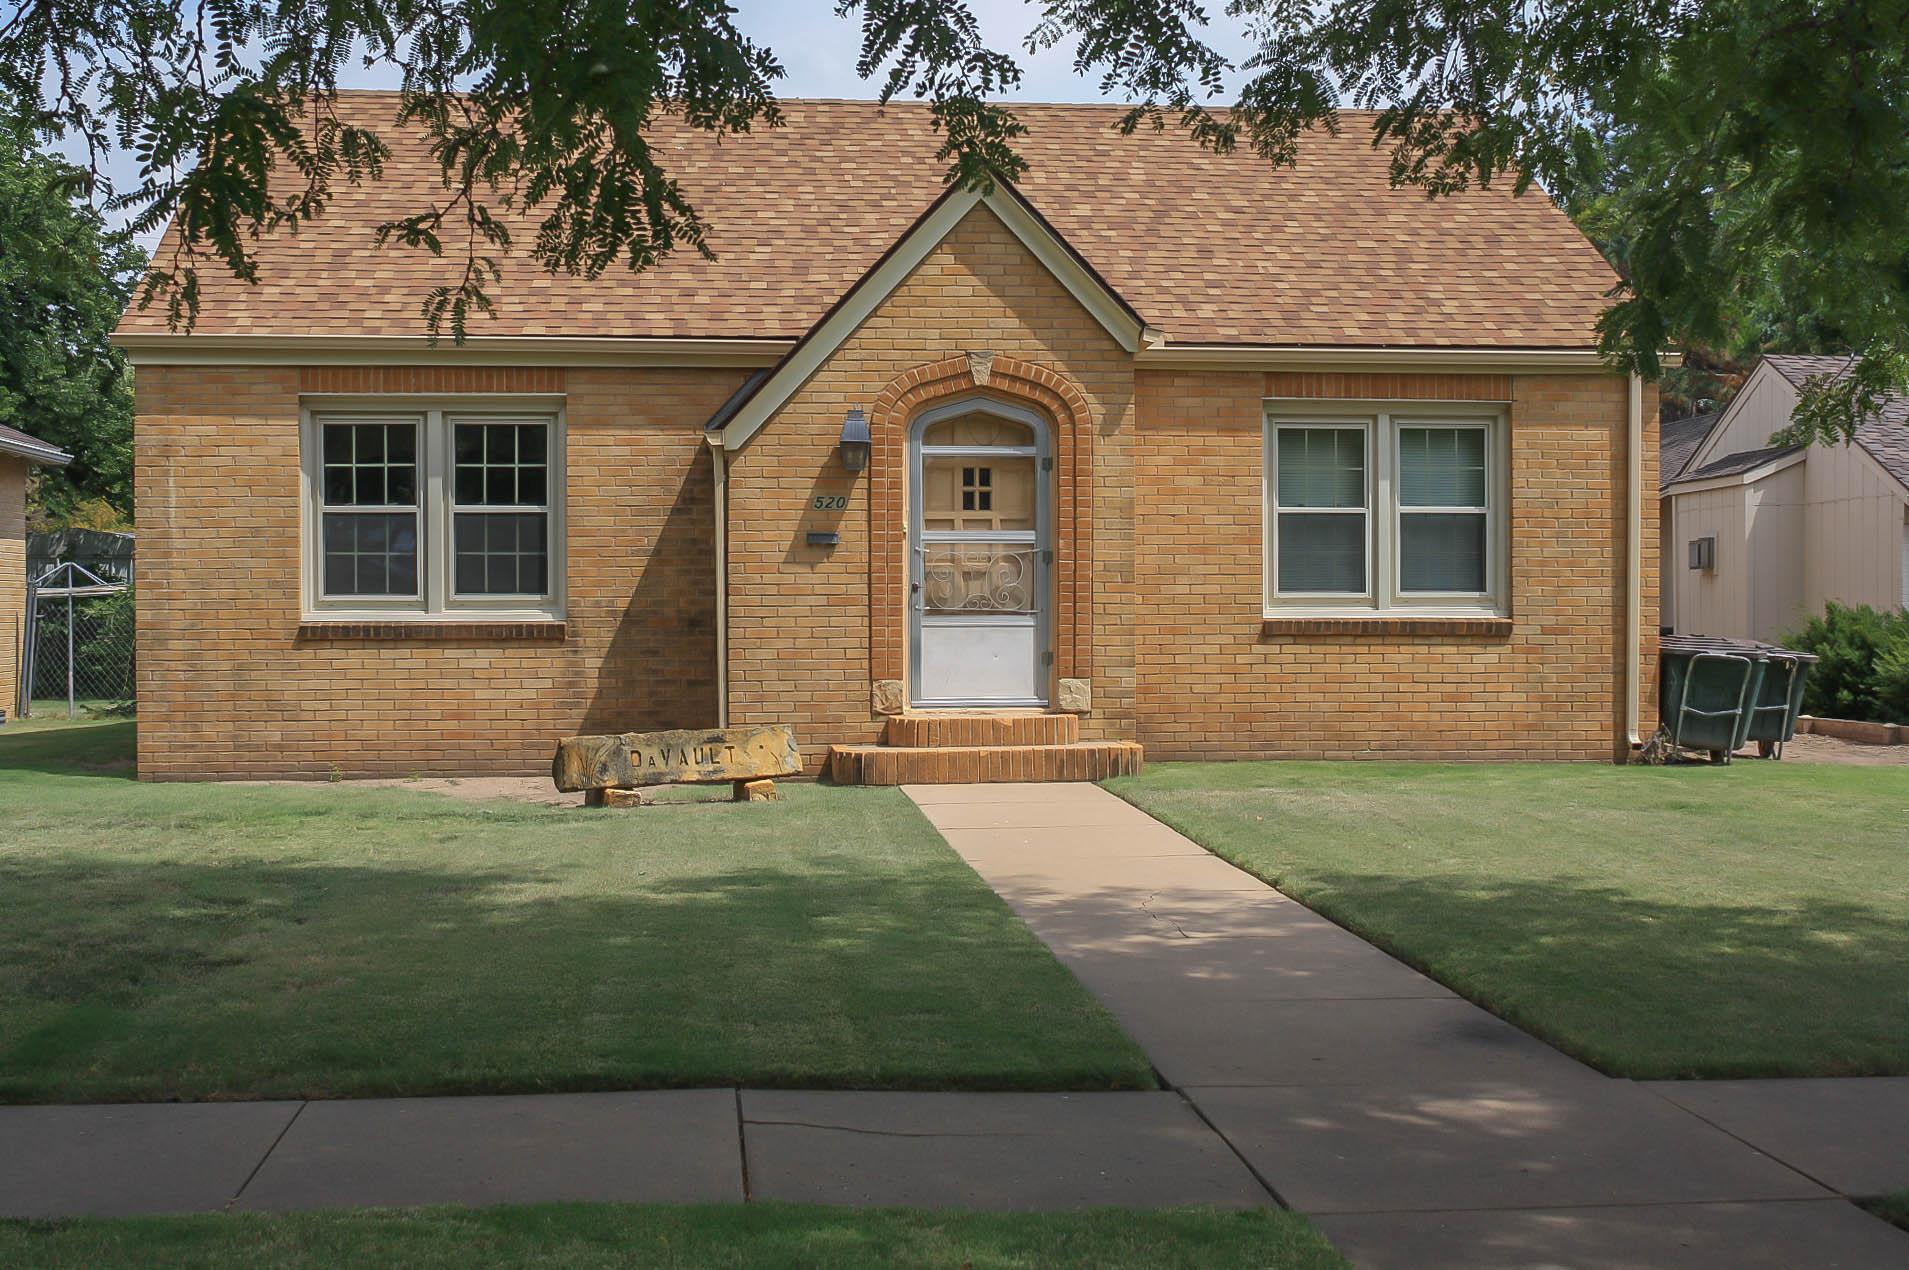 520 Champa St., Pratt, Kansas 67124